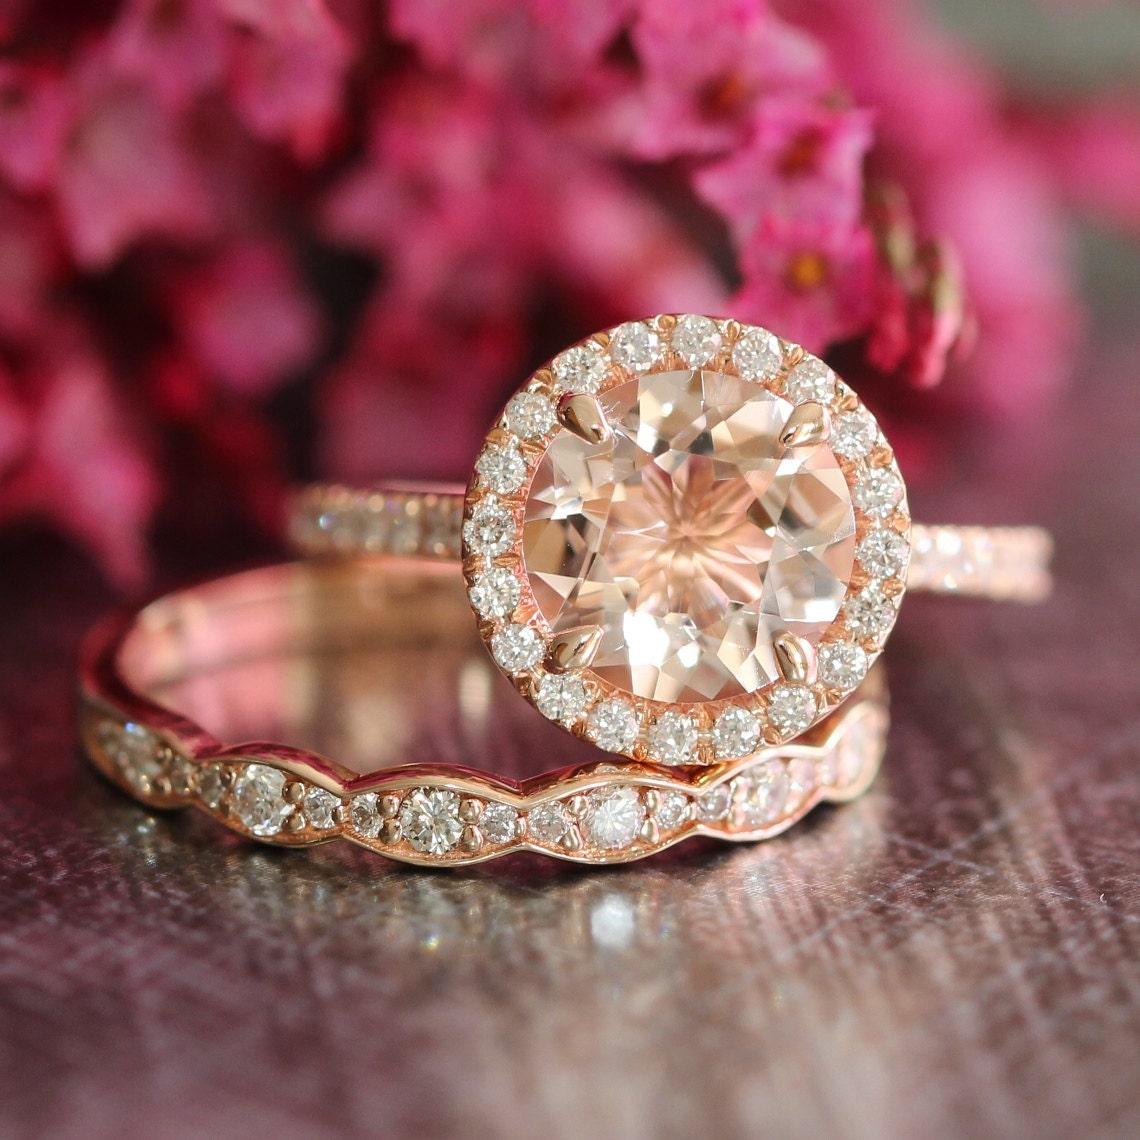 morganite engagement wedding ring set rose gold halo diamond. Black Bedroom Furniture Sets. Home Design Ideas